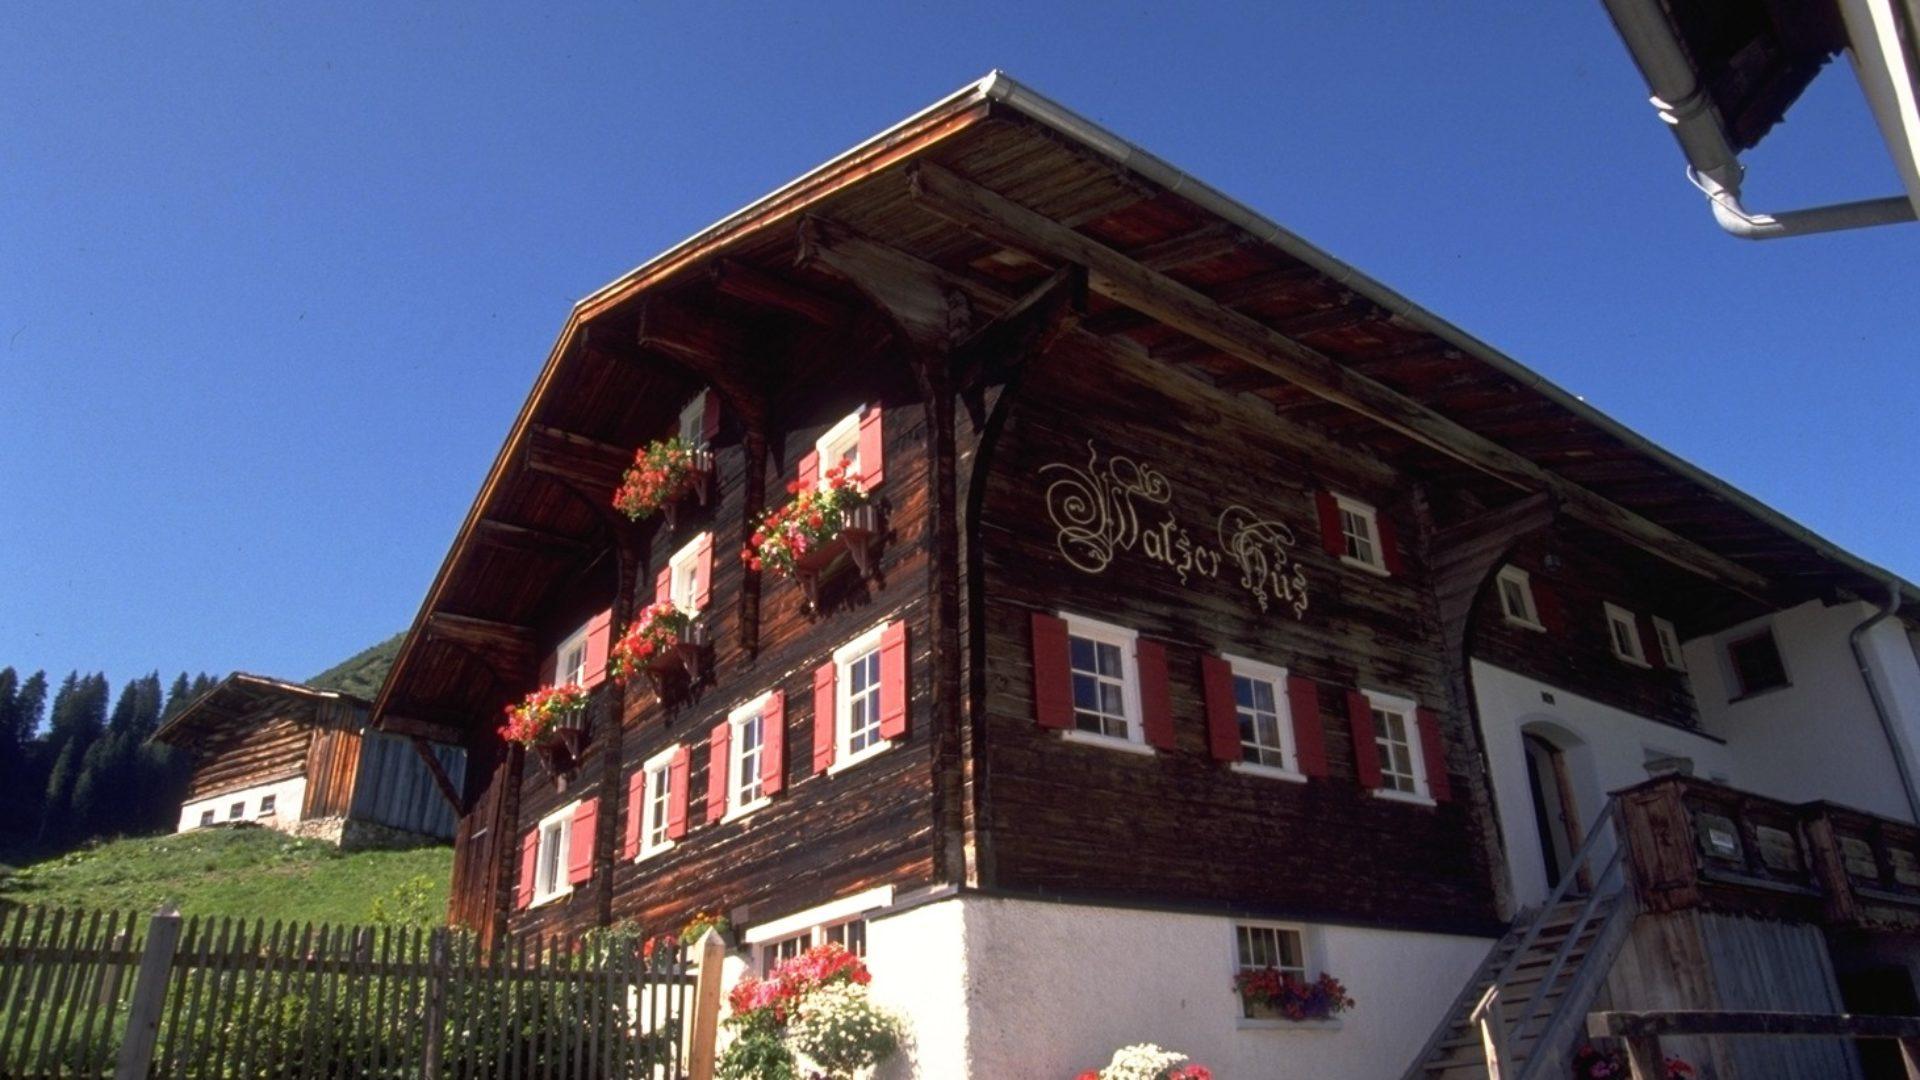 Walserhus in Warth